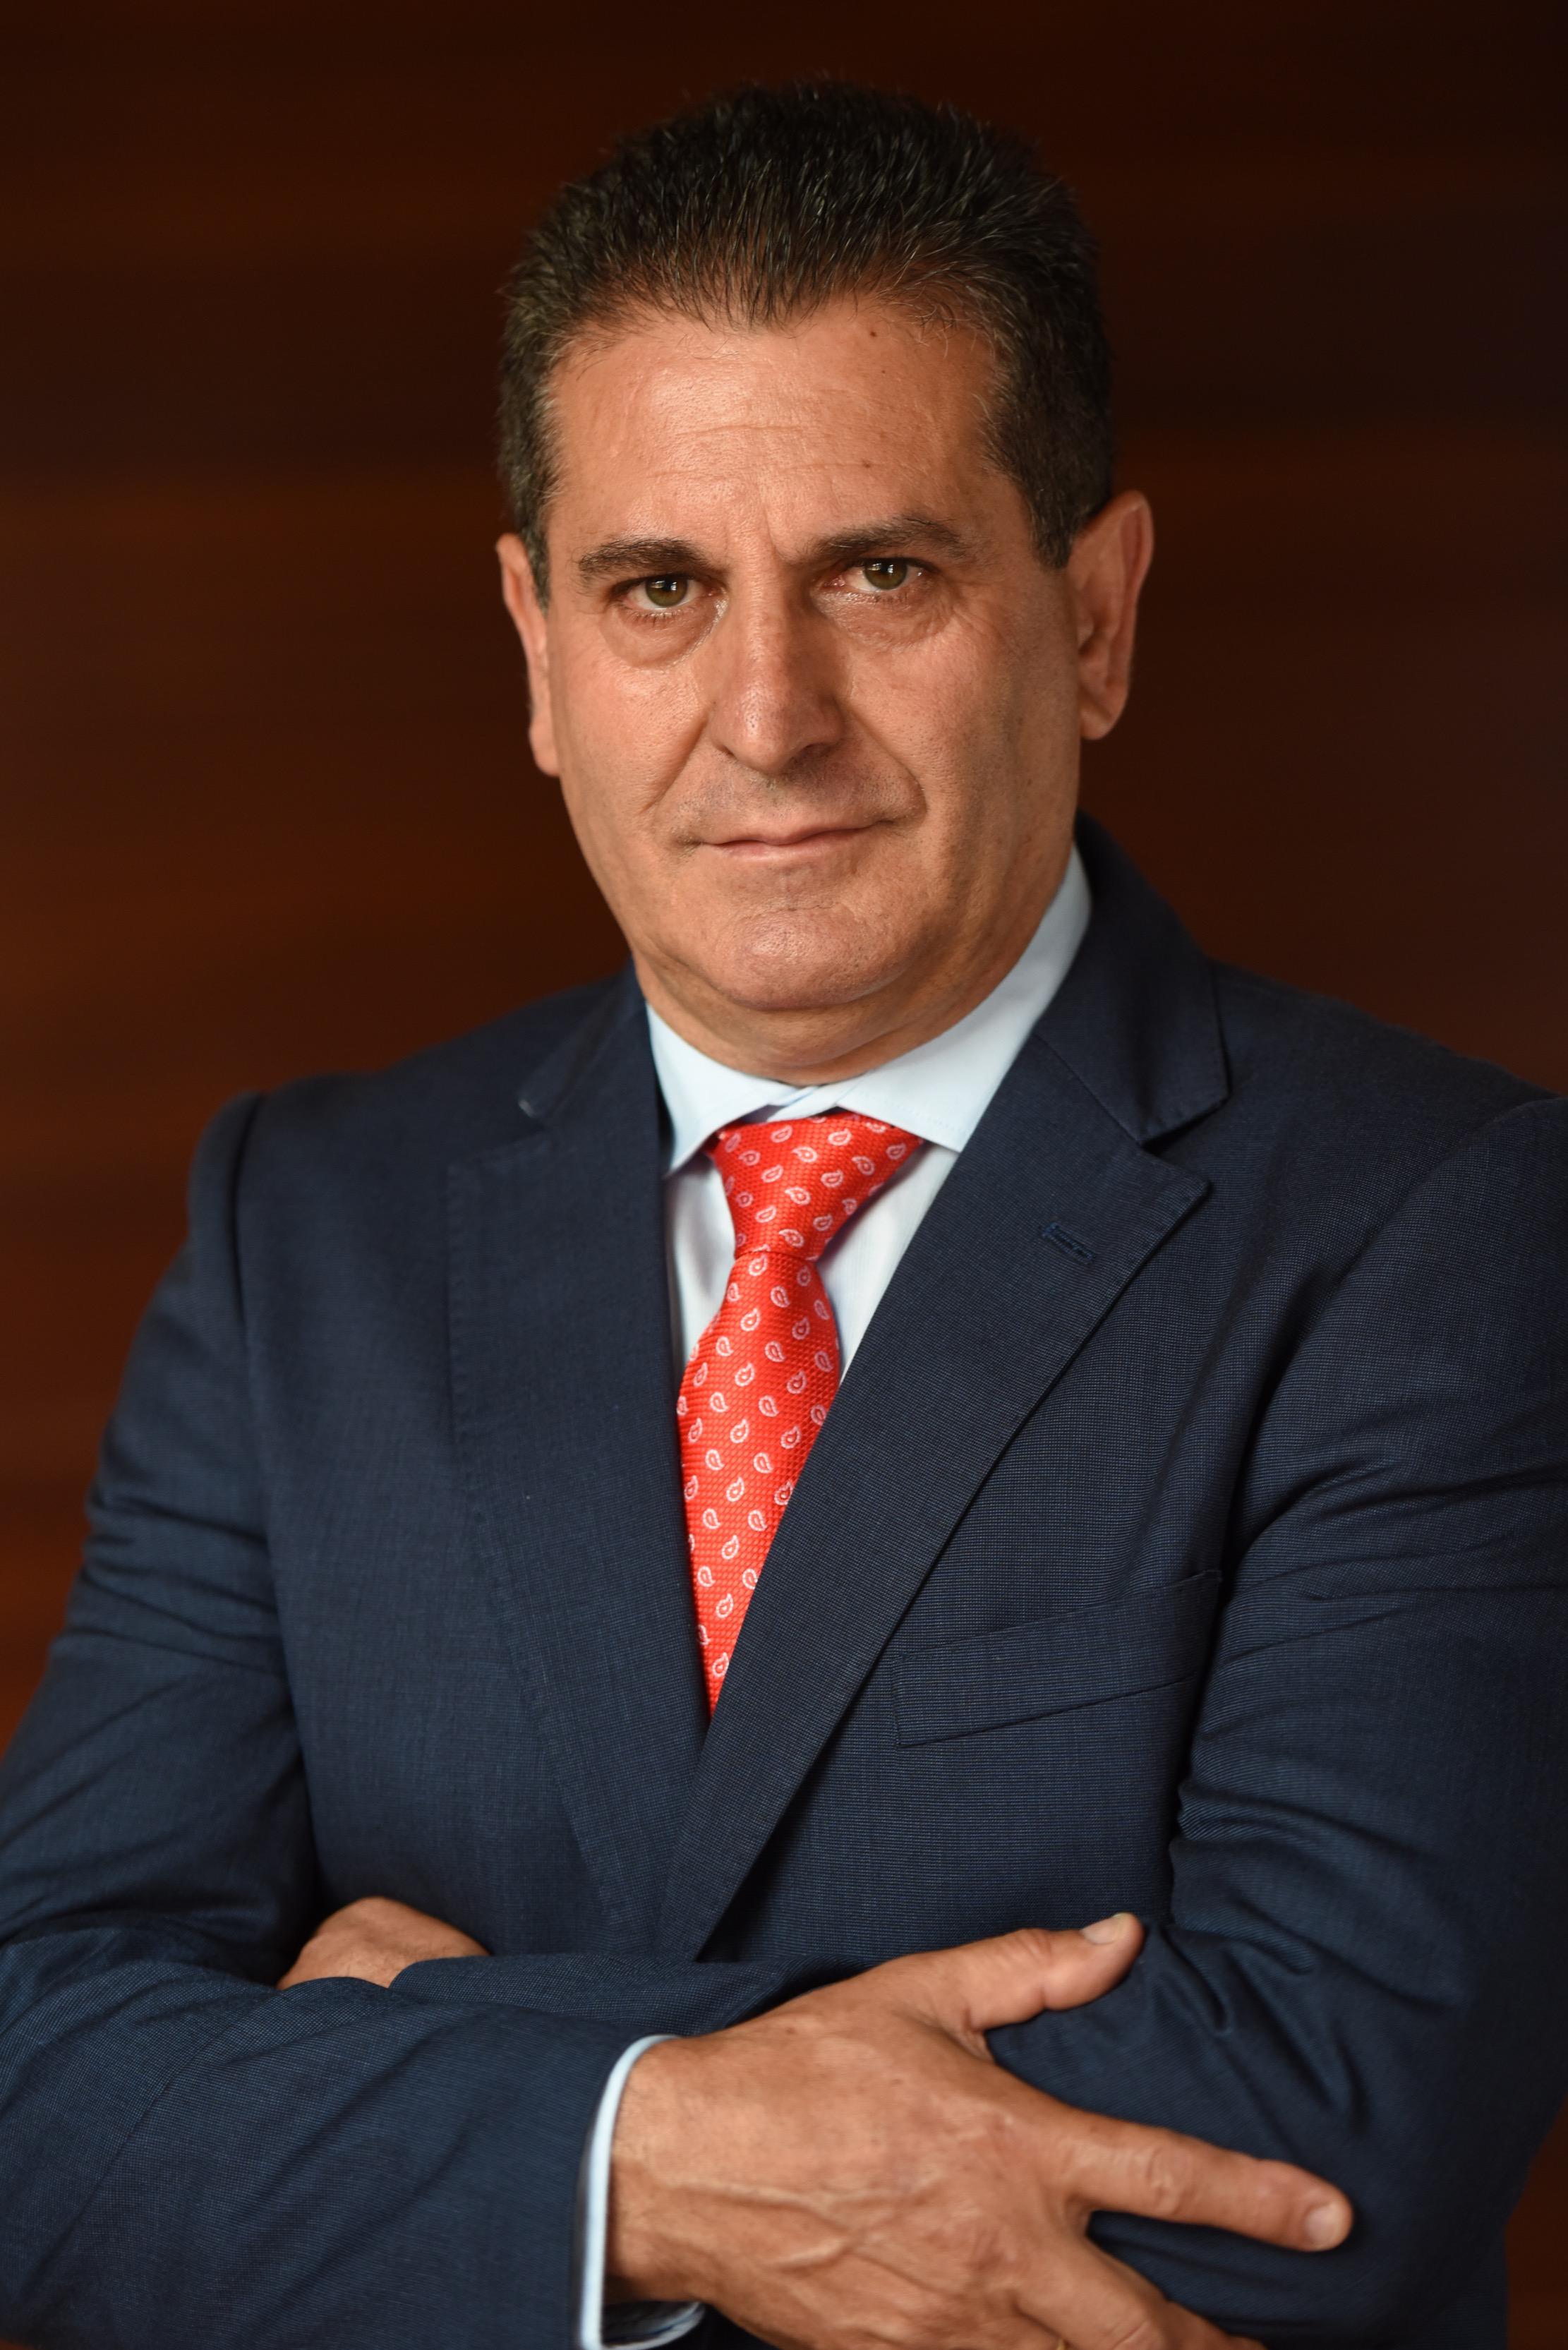 Juan Rafael Zamora Padrón, viceconsejero de Acción Exterior